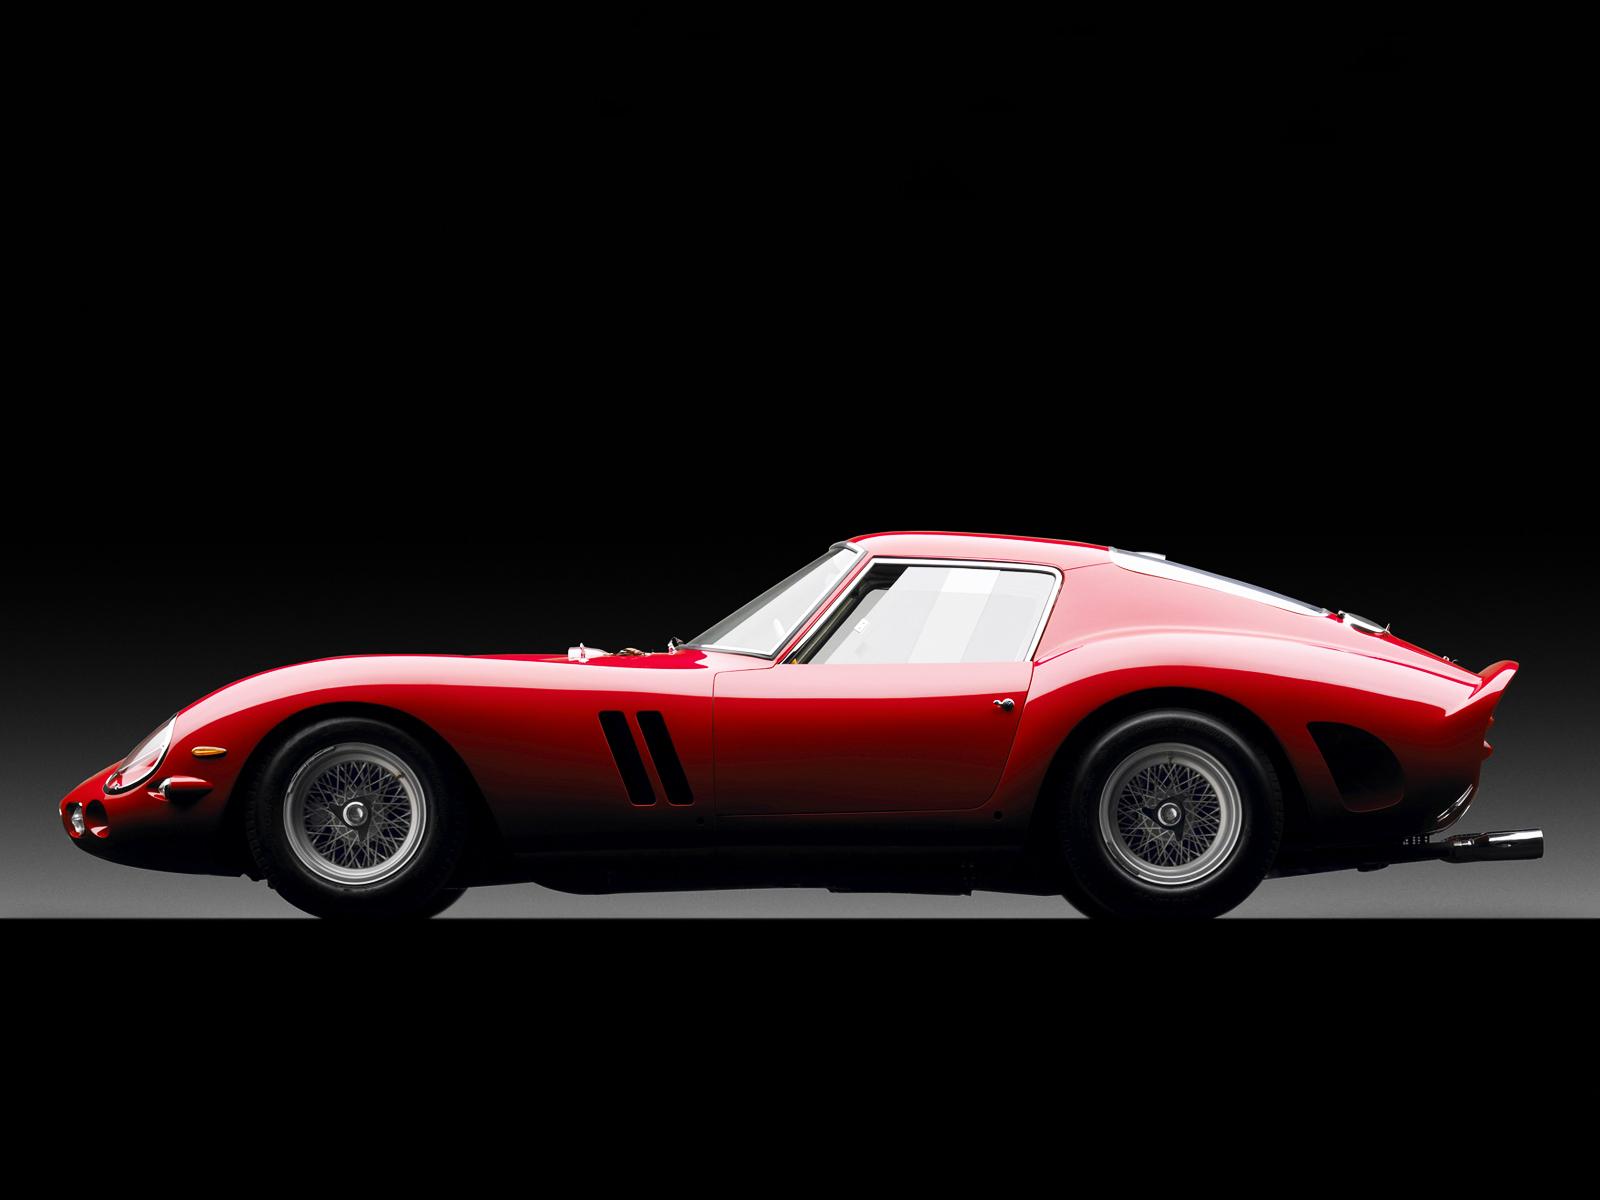 The Cars 2 Wallpaper 1962 Ferrari 250 Gto Series I Supercar Supercars Classic G